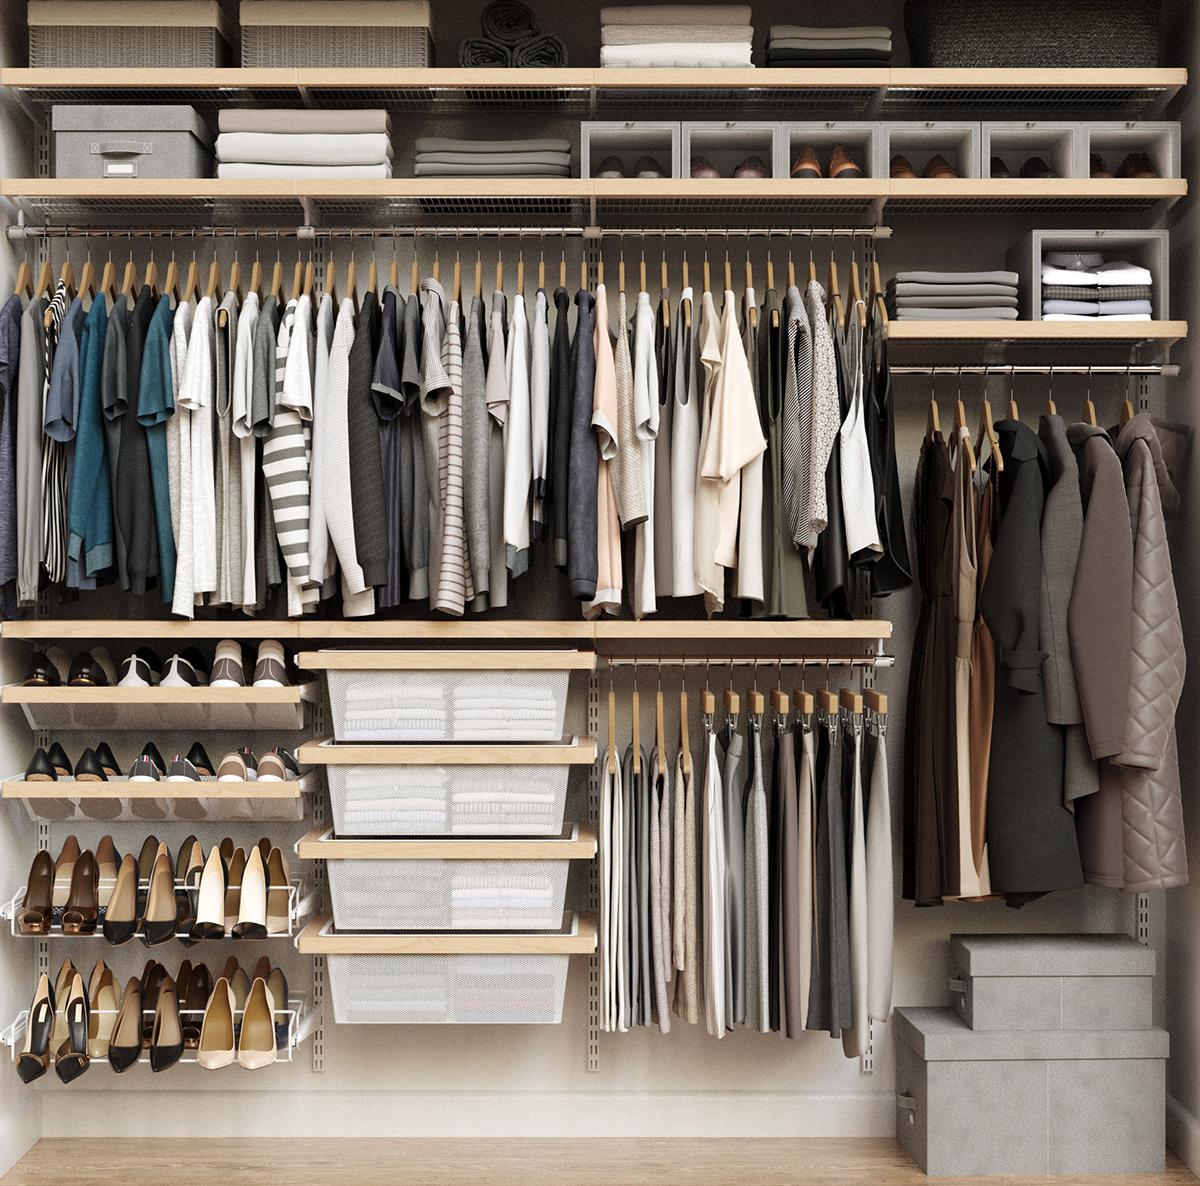 Elfa Décor 8' White & Birch Reach-In Closet